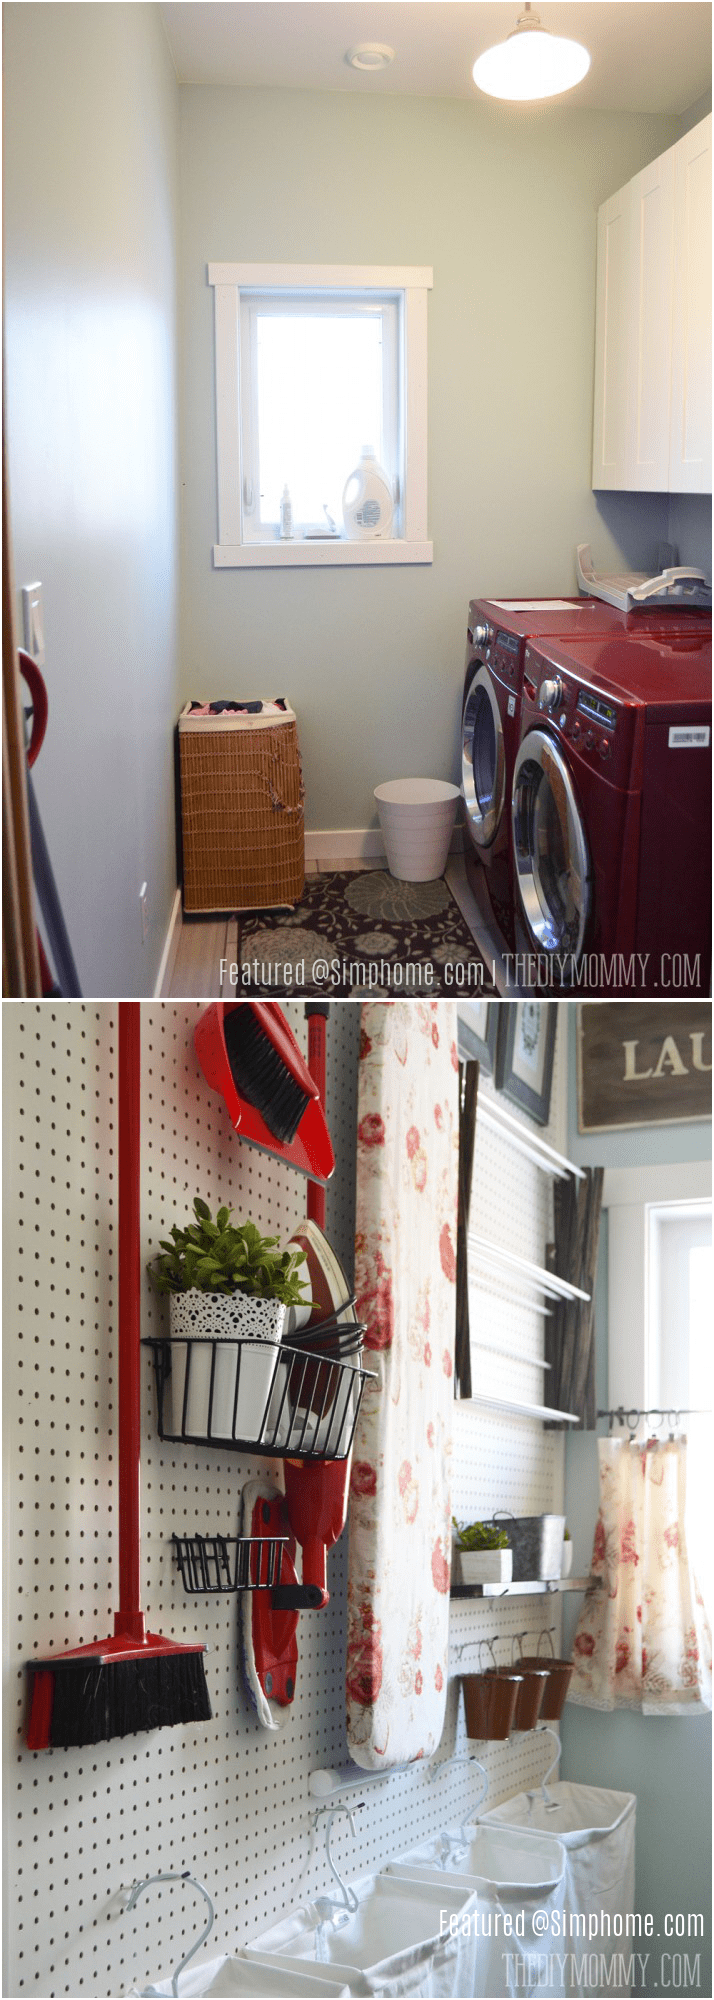 7.Simphome.com Bye Bye Messy Laundry Room